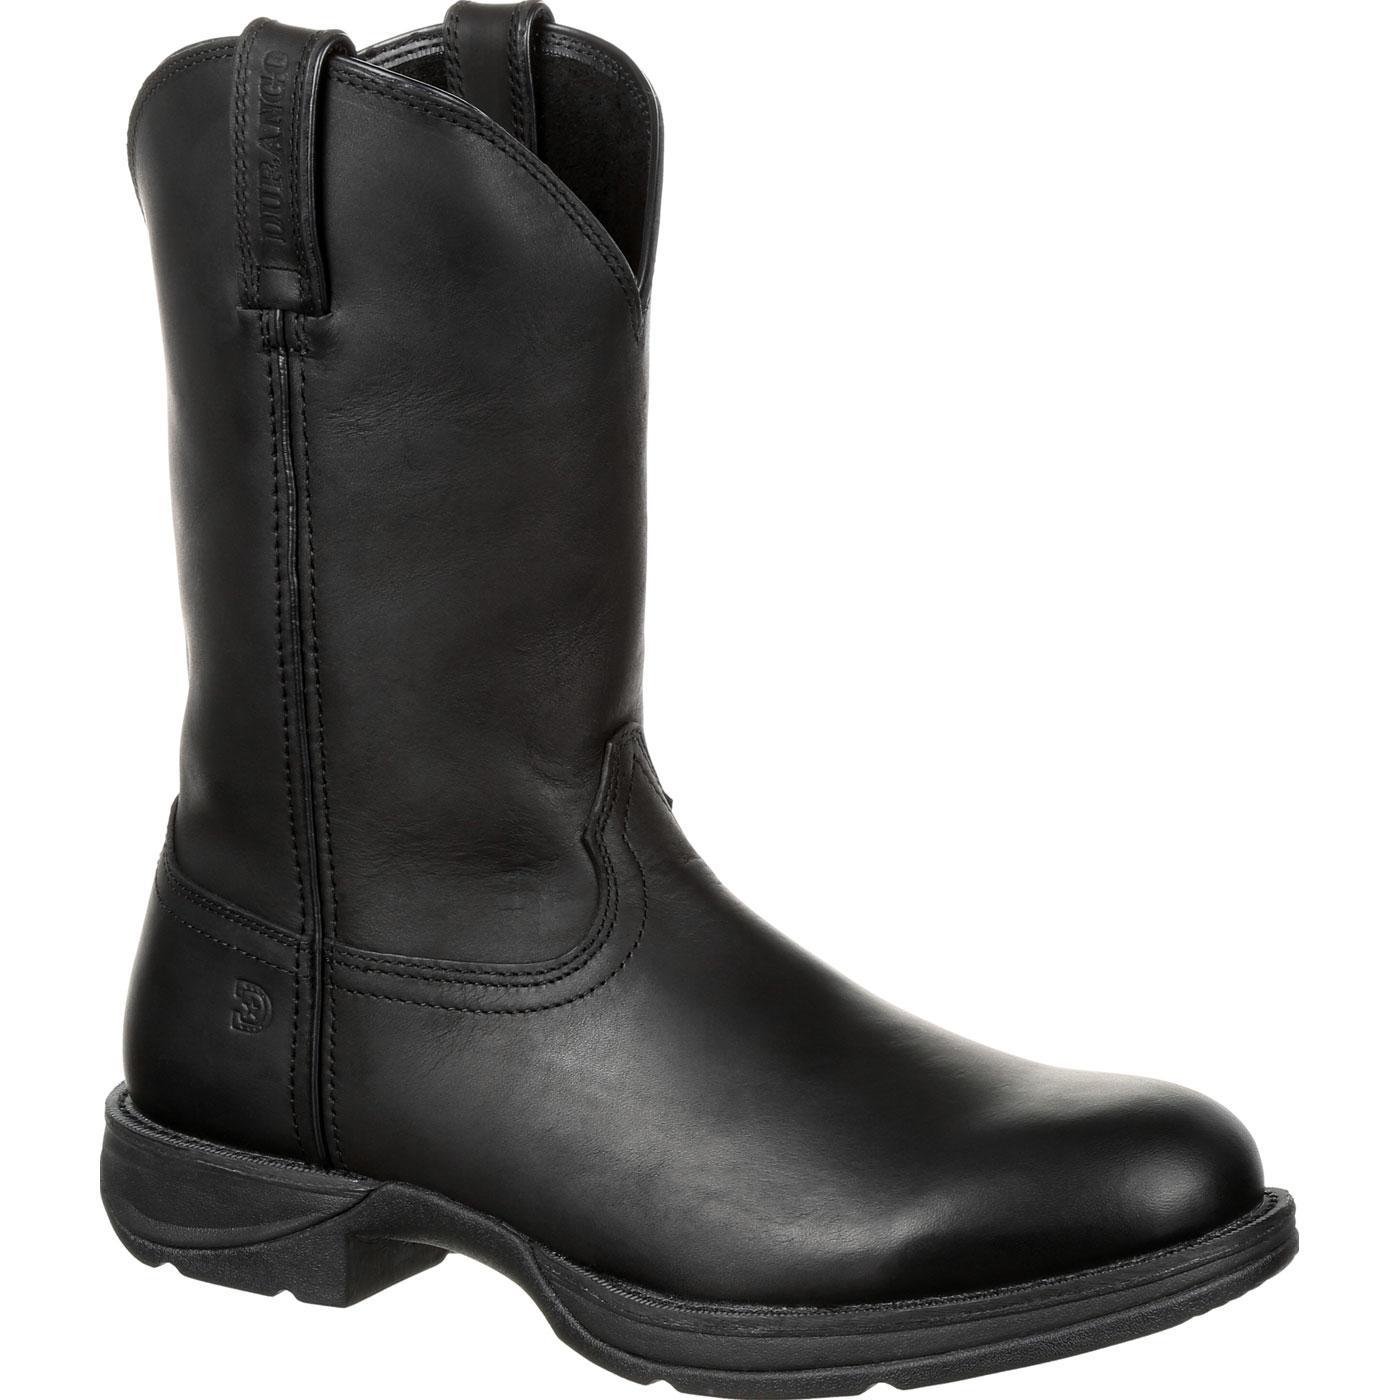 Rebel by Durango Black Round Toe Western Boot, , large